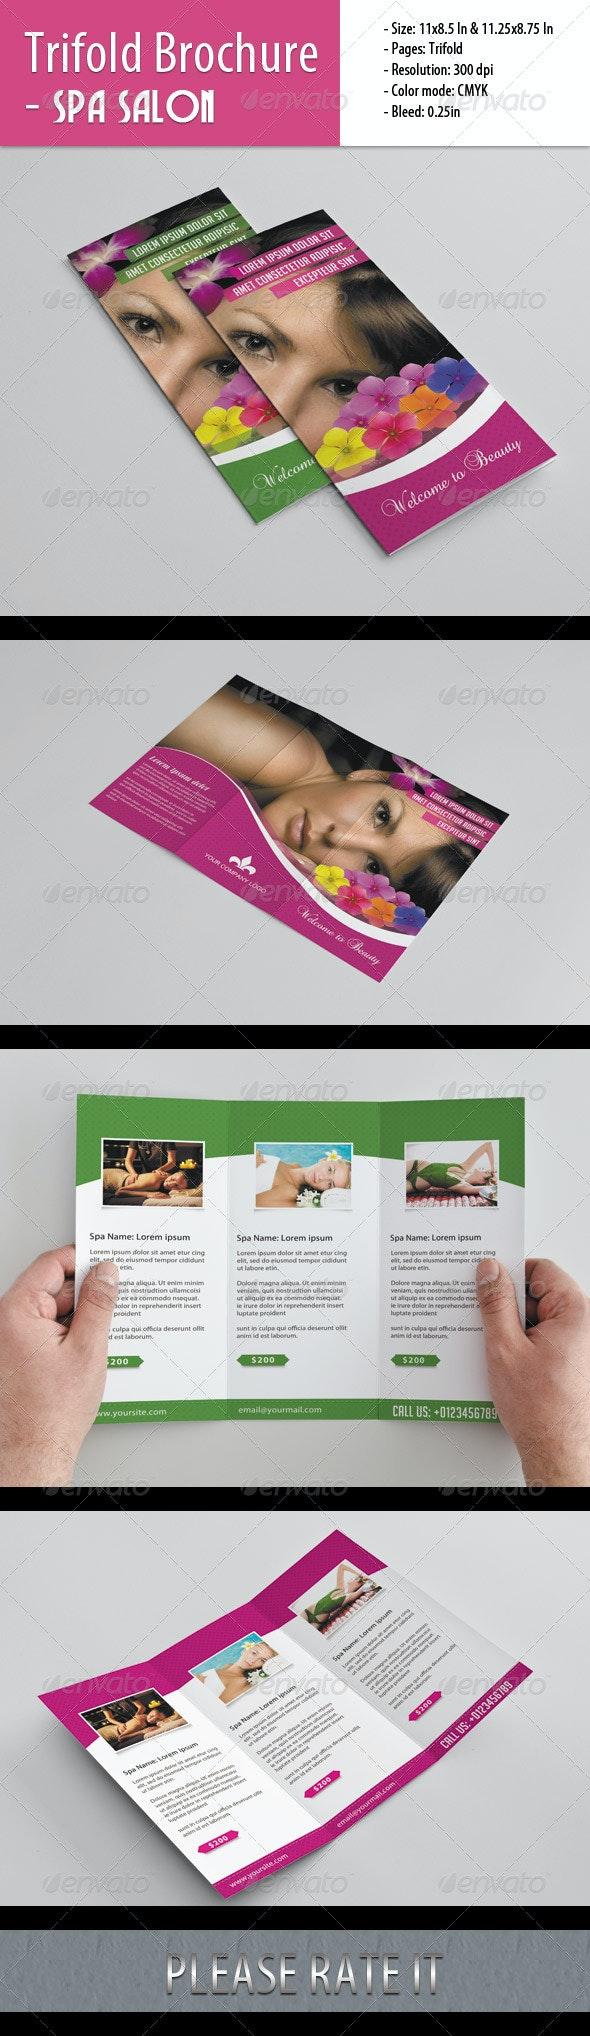 Trifold Brochure For Spa Salon - Corporate Brochures